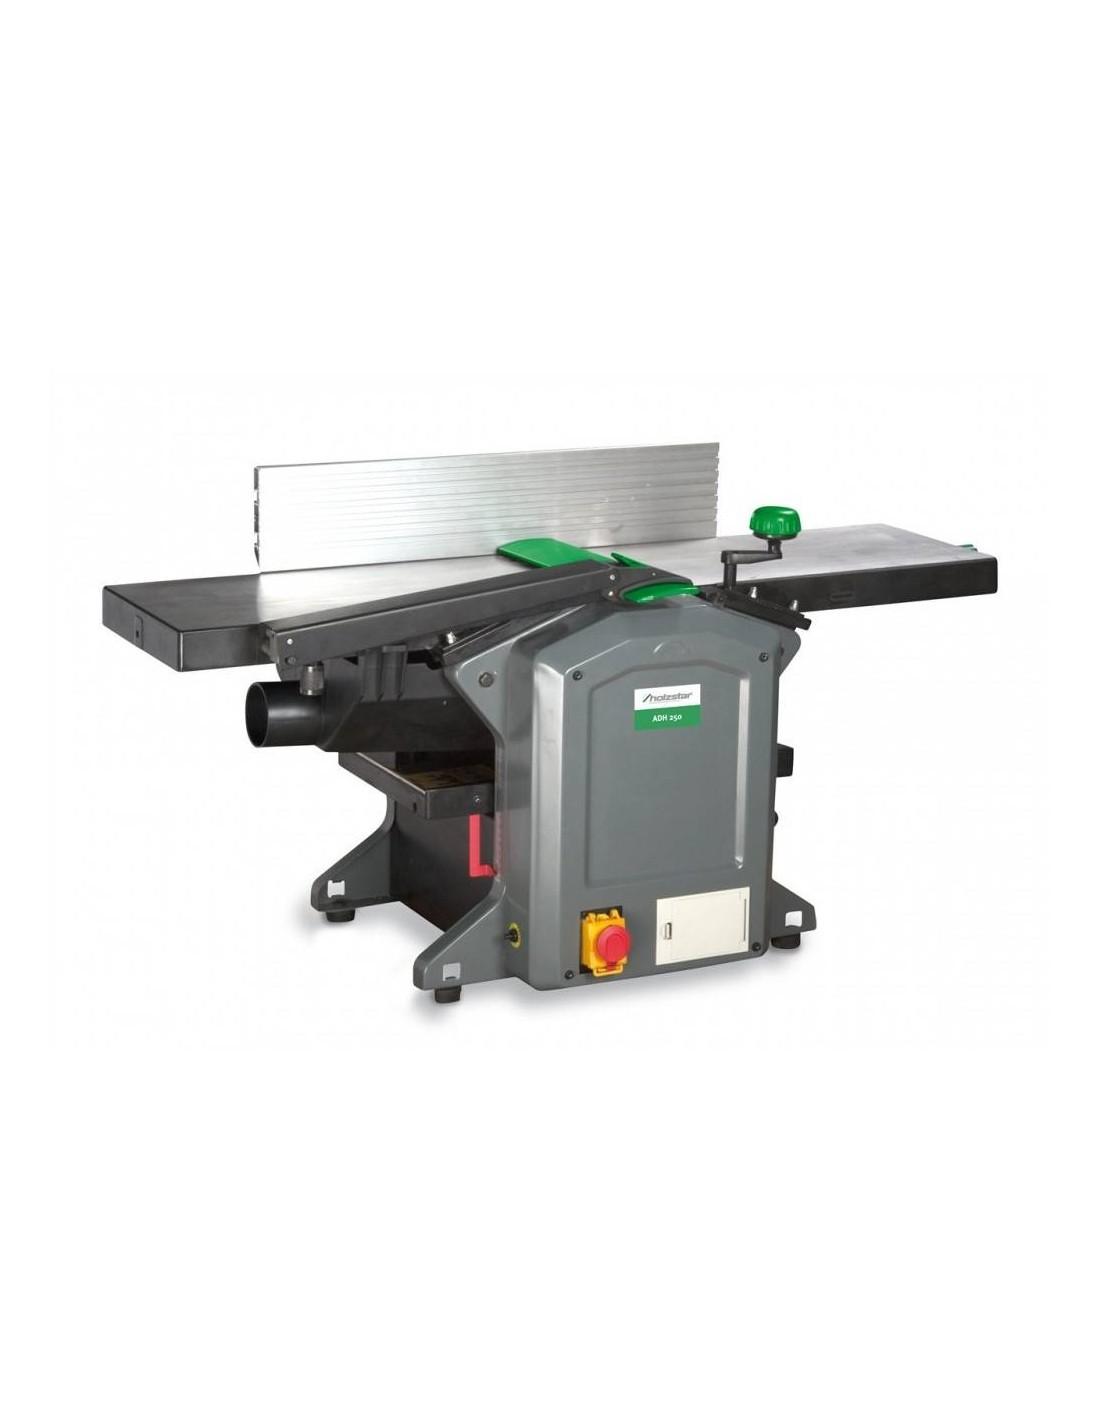 Masina pentru rindeluire si degrosare Holzstar ADH 250